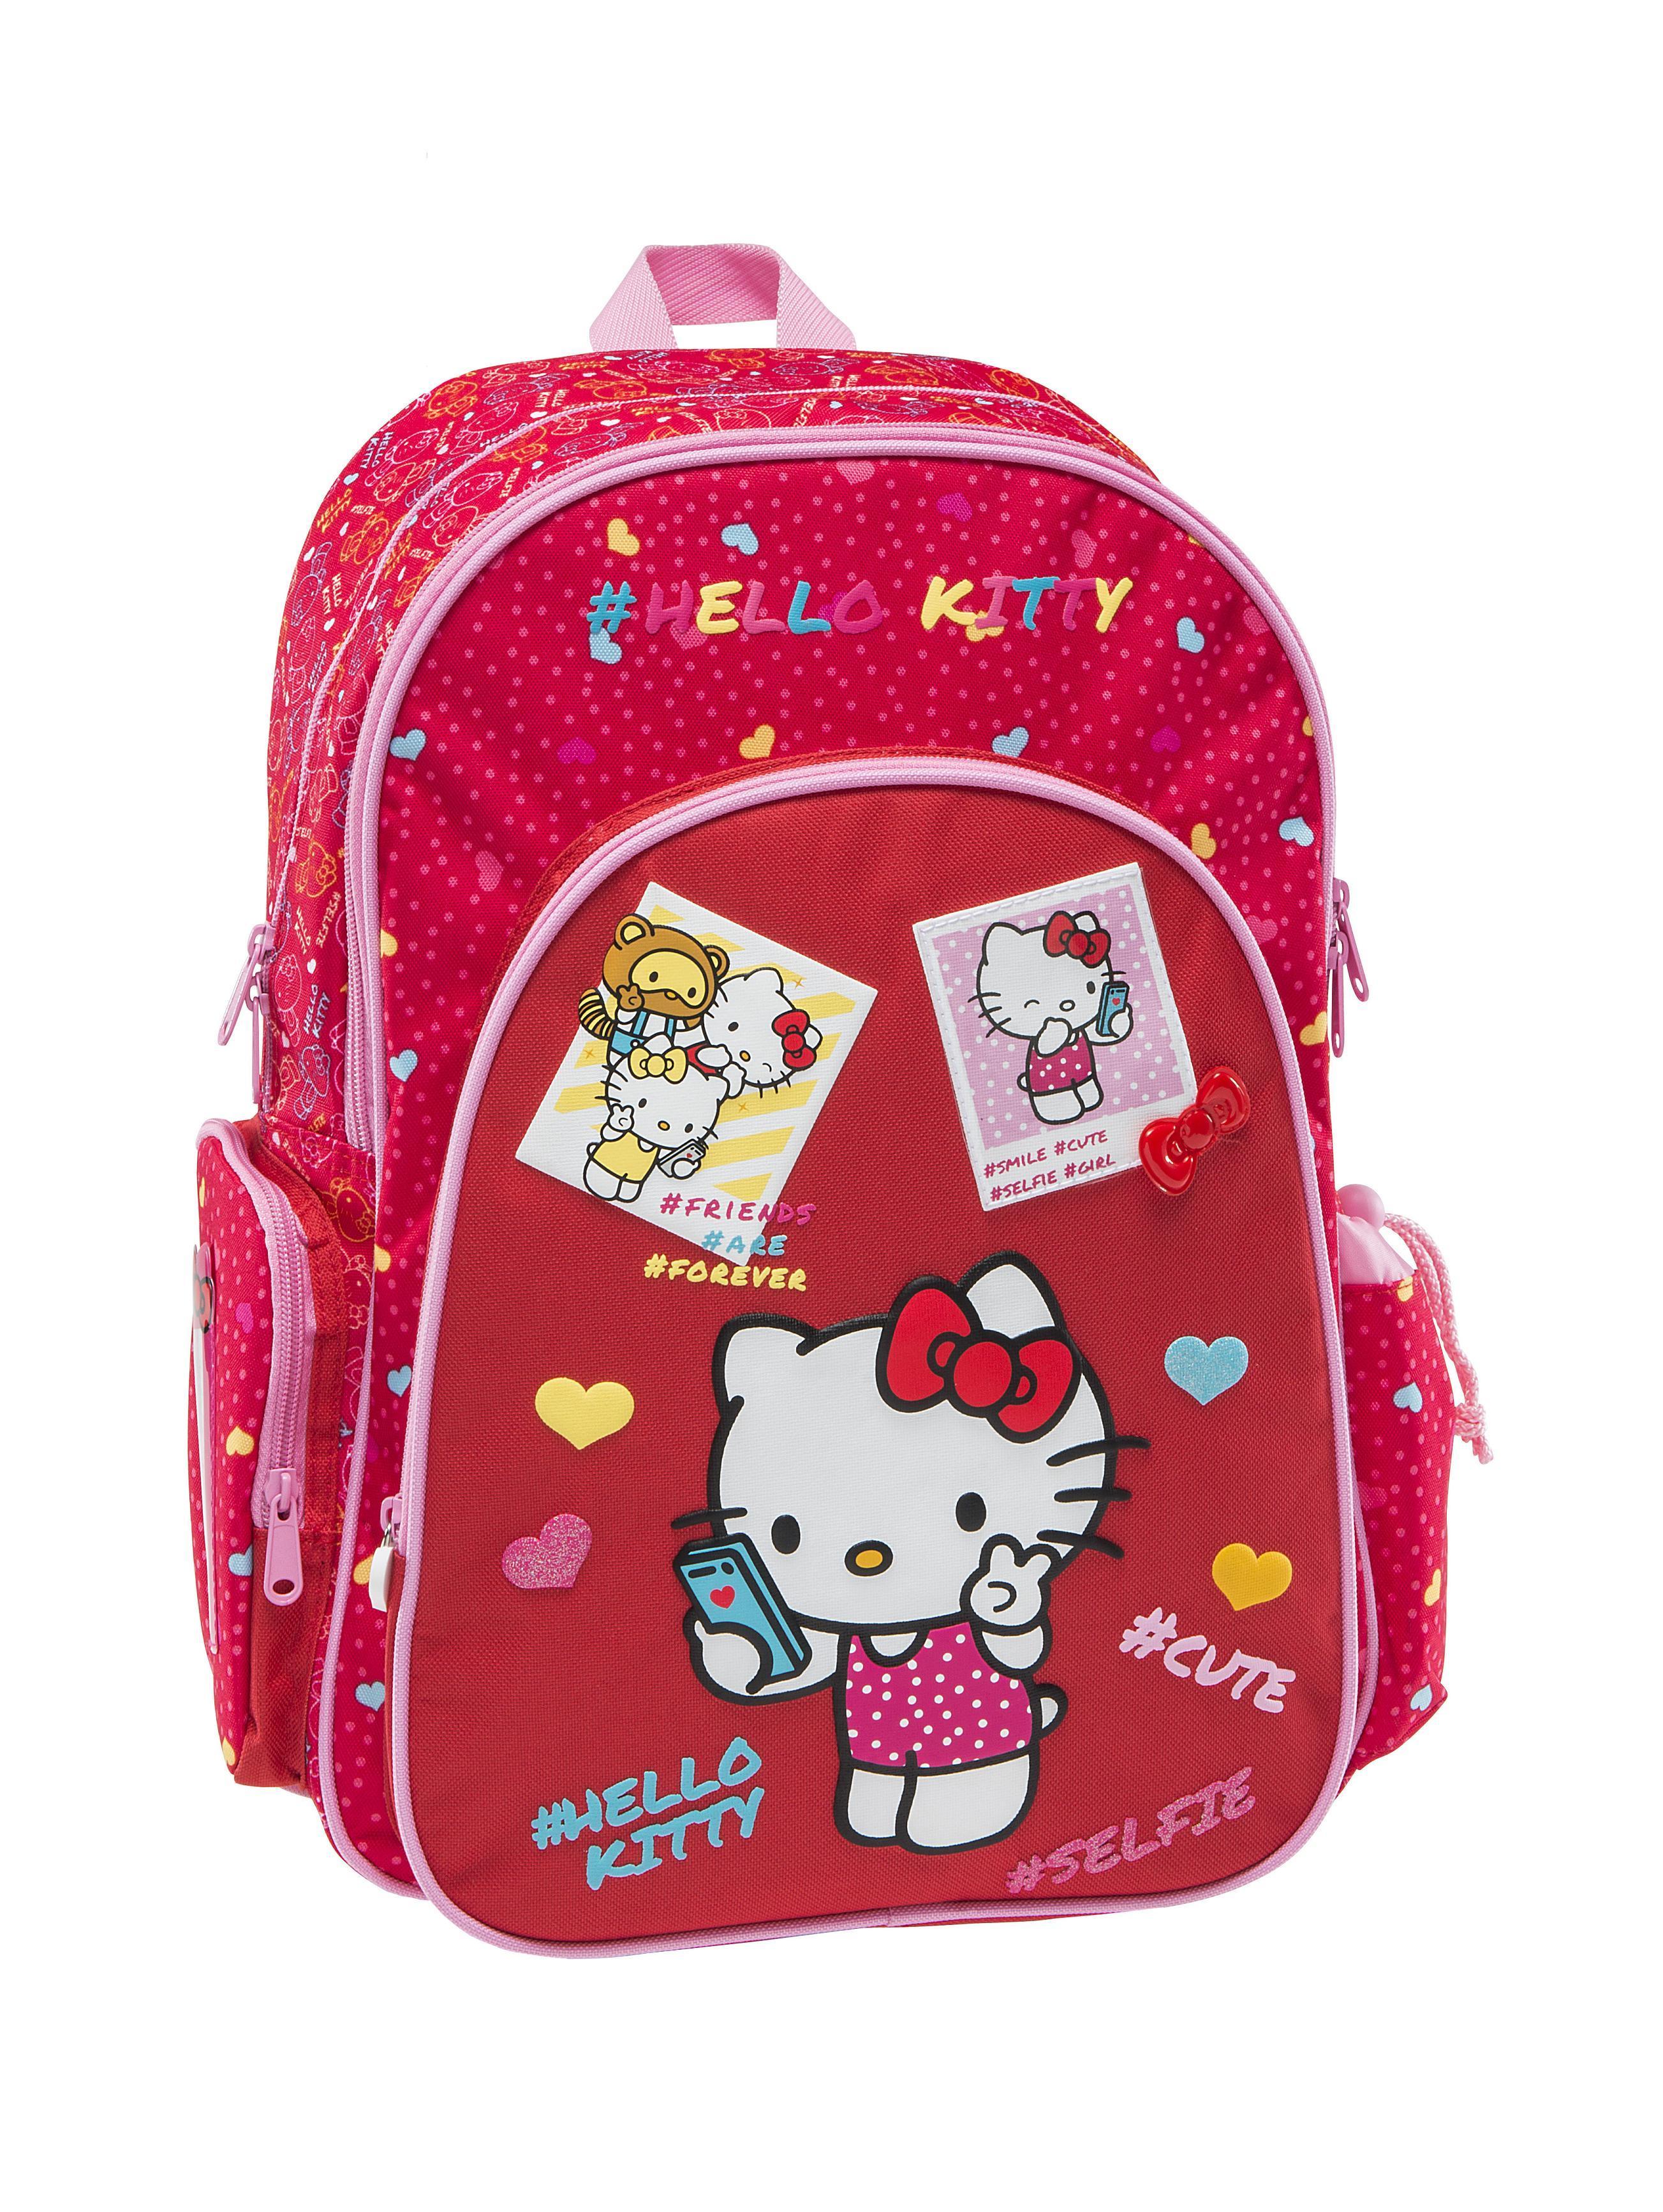 fa9bb523c7 Graffiti - Σακίδιο σχολικό πολυθεσιακό Hello Kitty kids κόκκινο ...